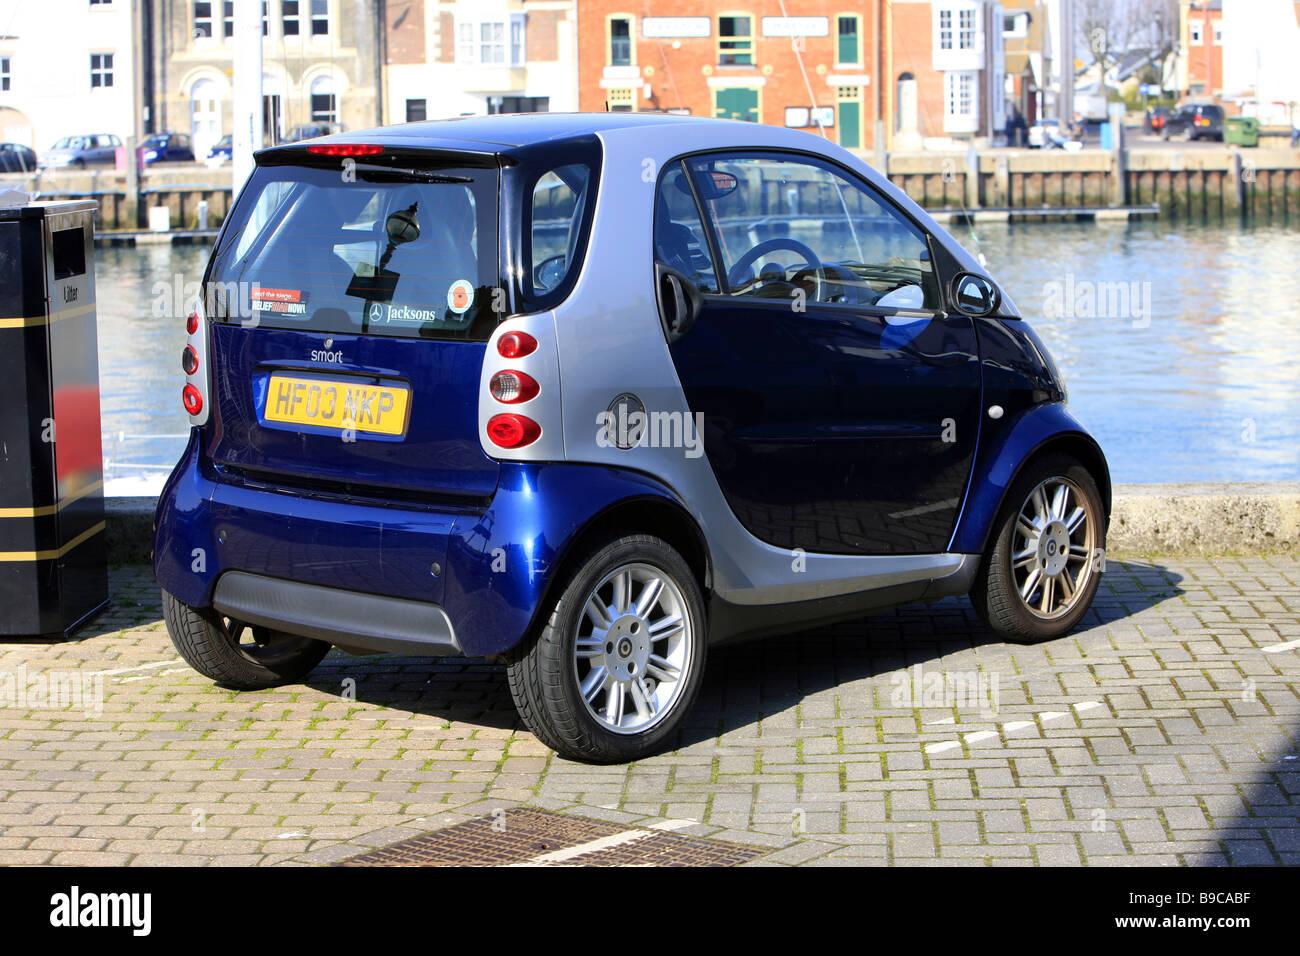 mercedes smart car stock photos mercedes smart car stock. Black Bedroom Furniture Sets. Home Design Ideas